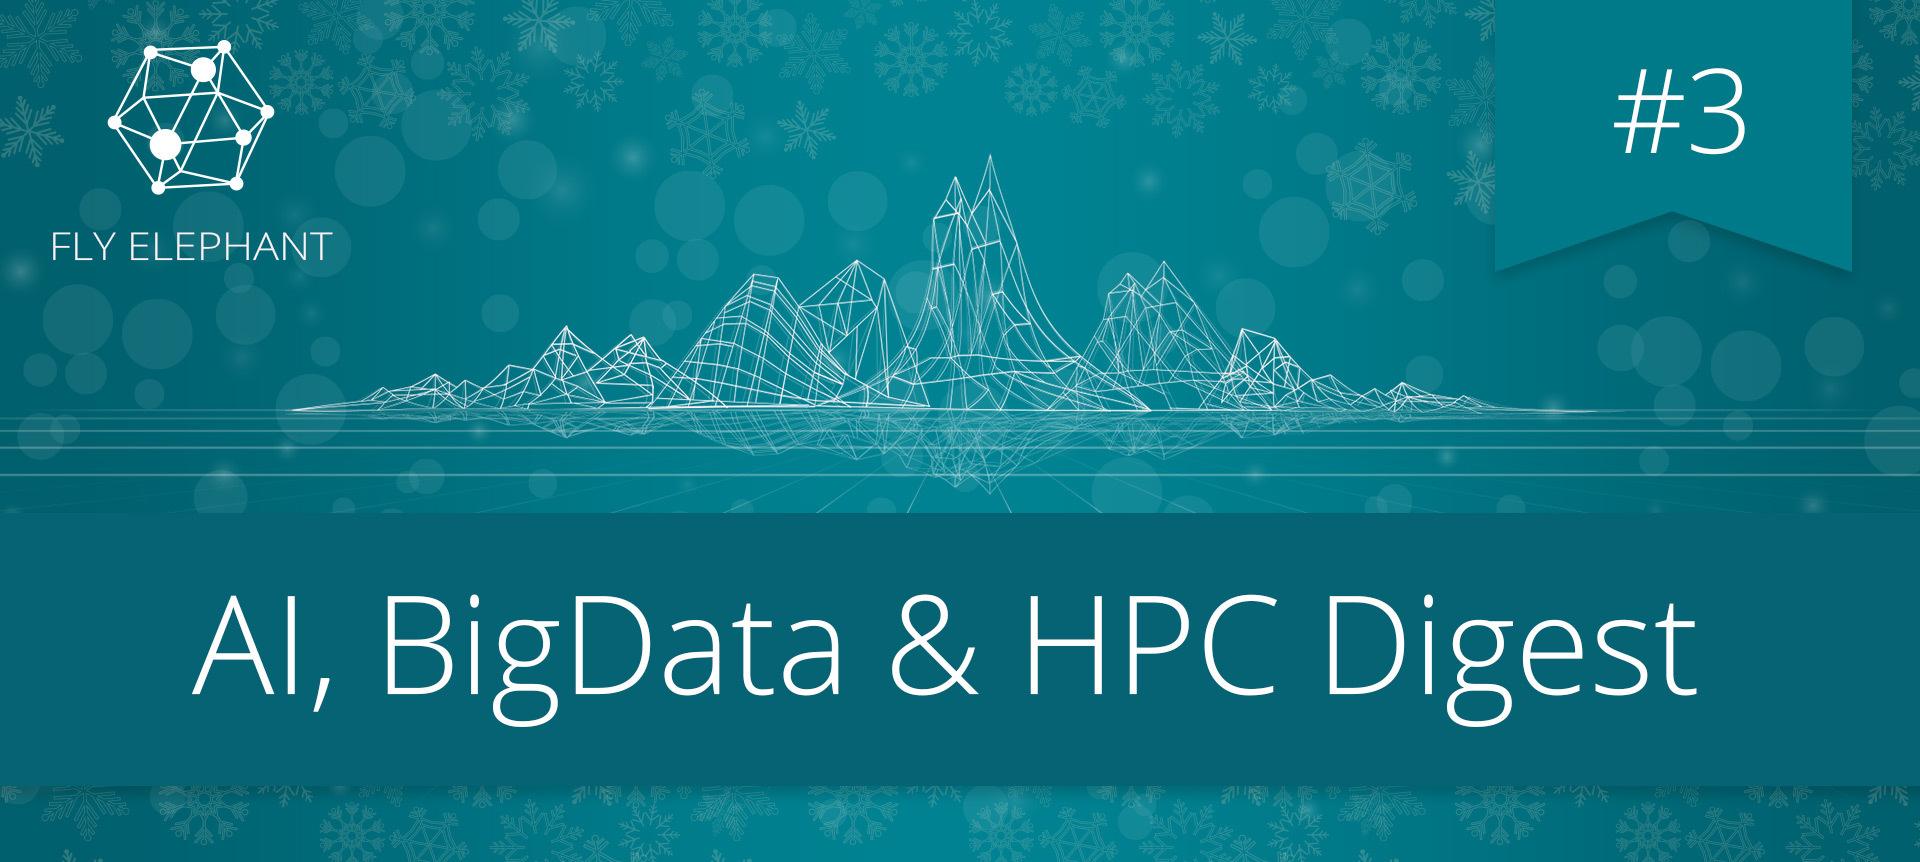 AI, BigData &HPC Digest #3